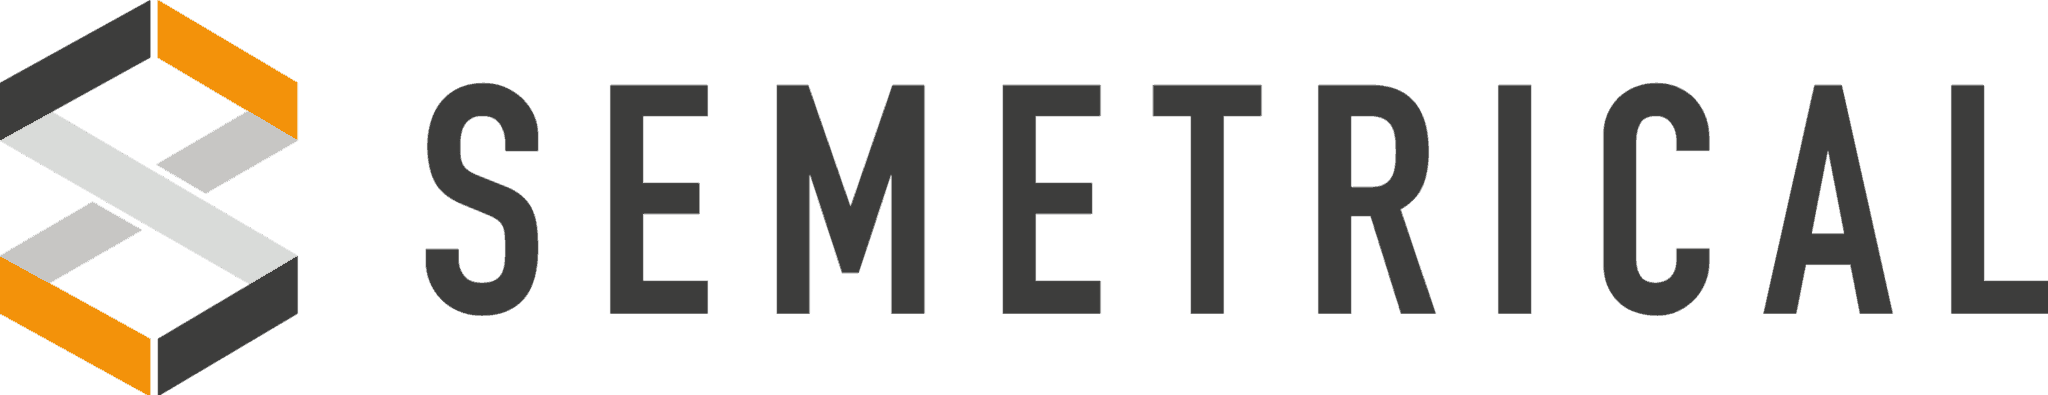 semetrical_logo.png